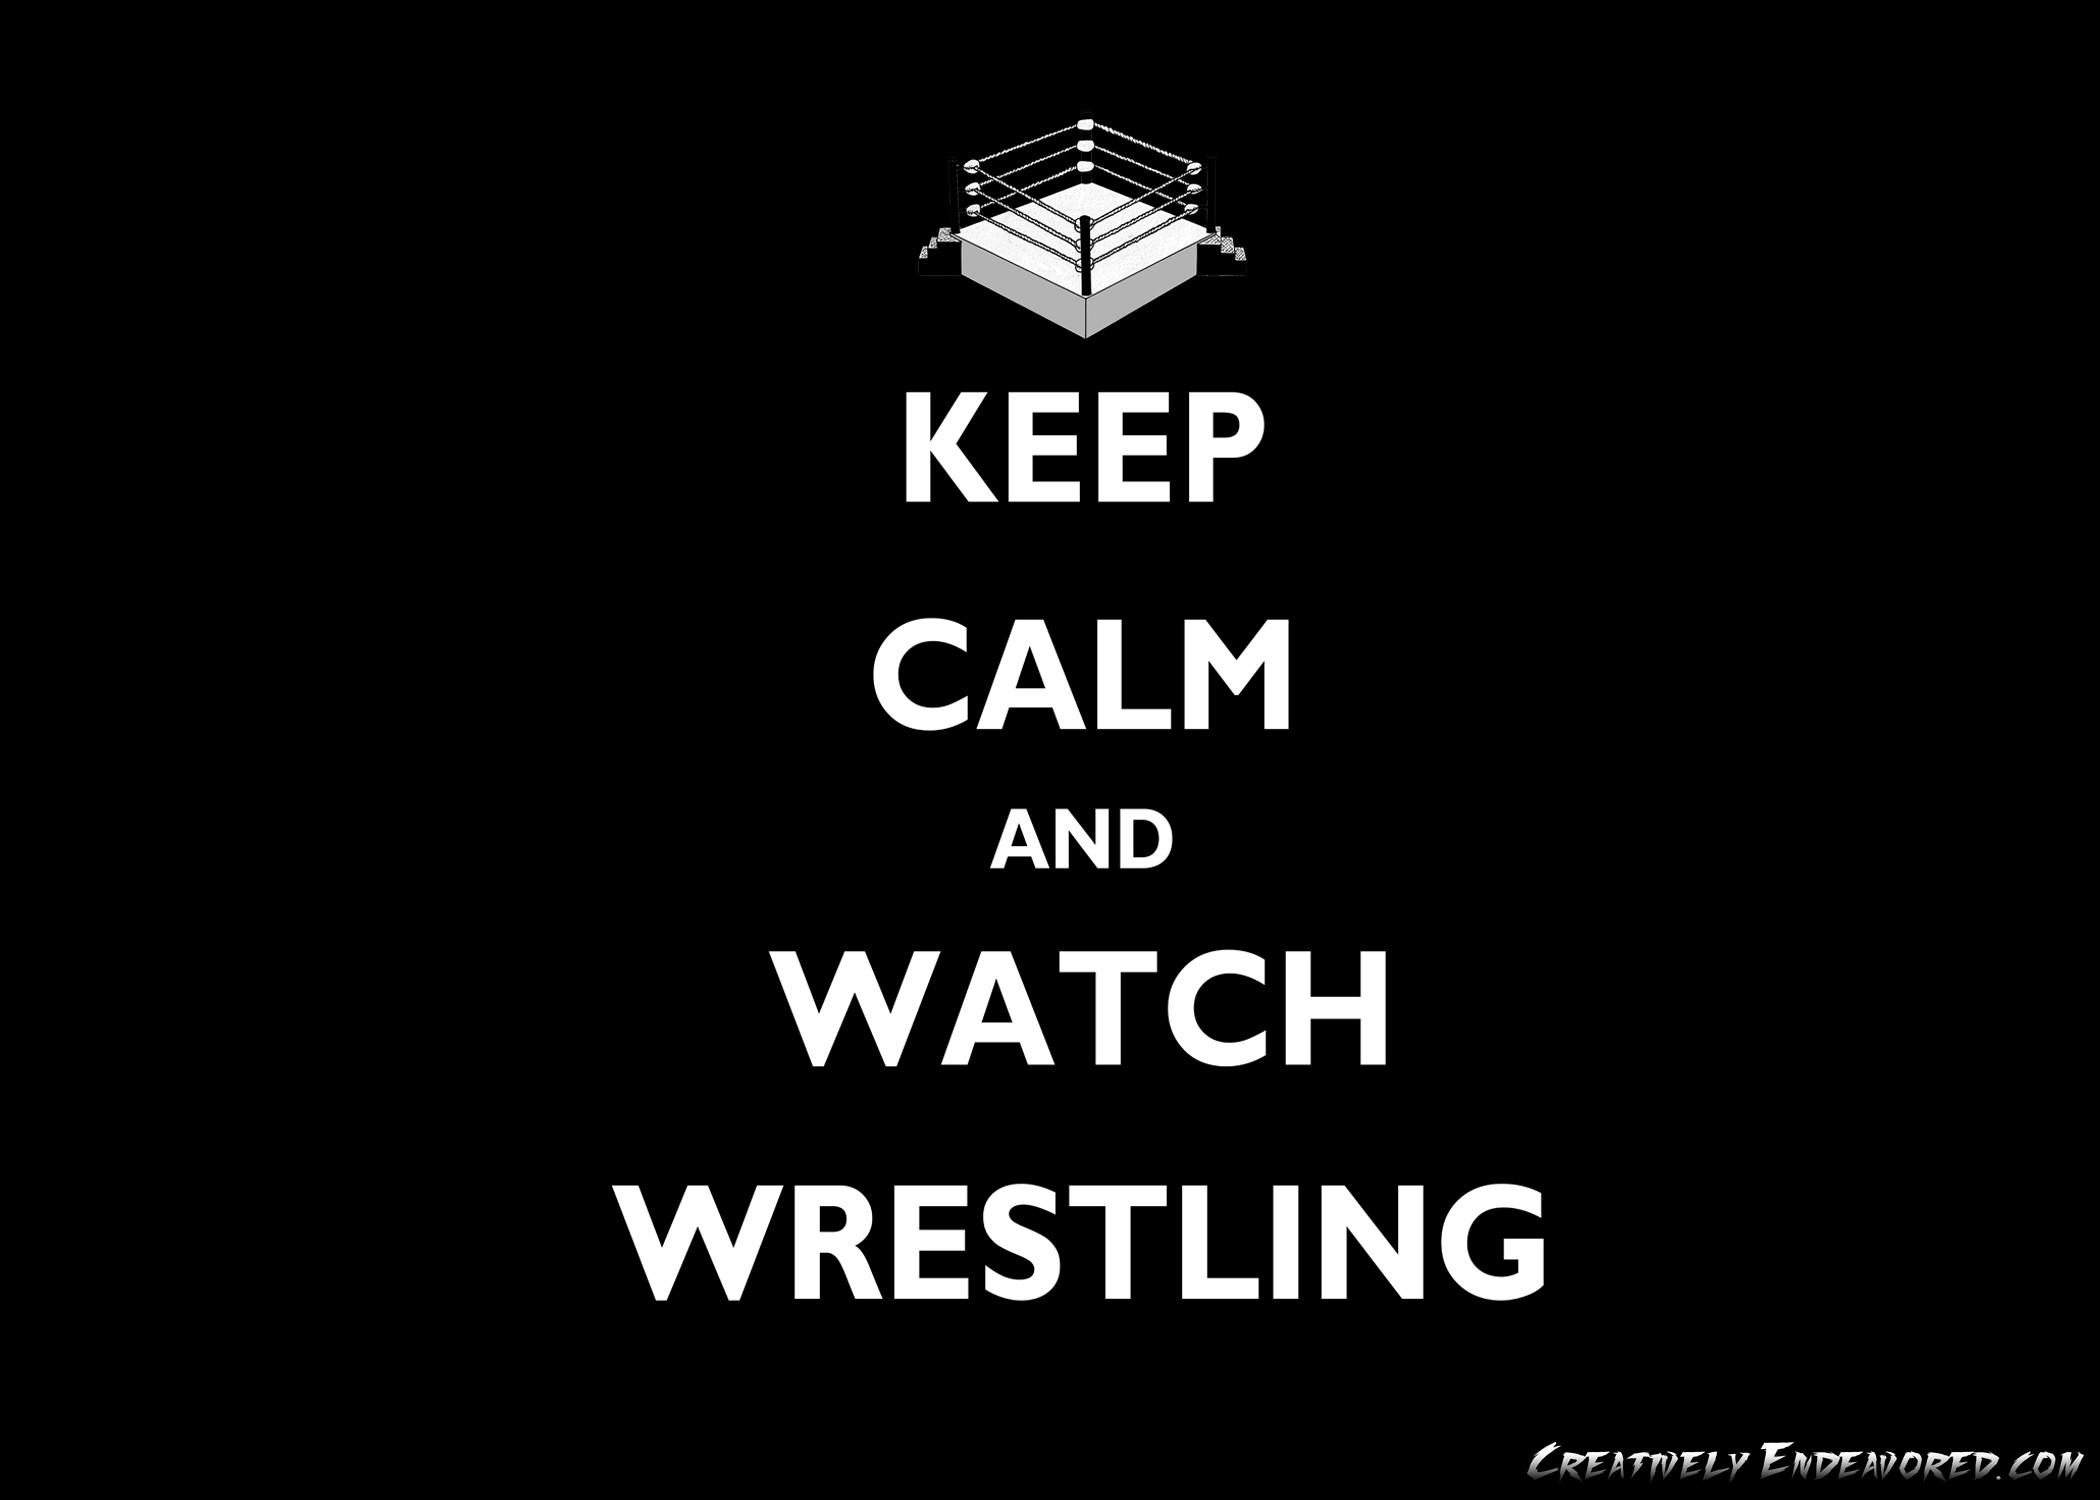 WWE Wrestling Wallpaper (67+ images)